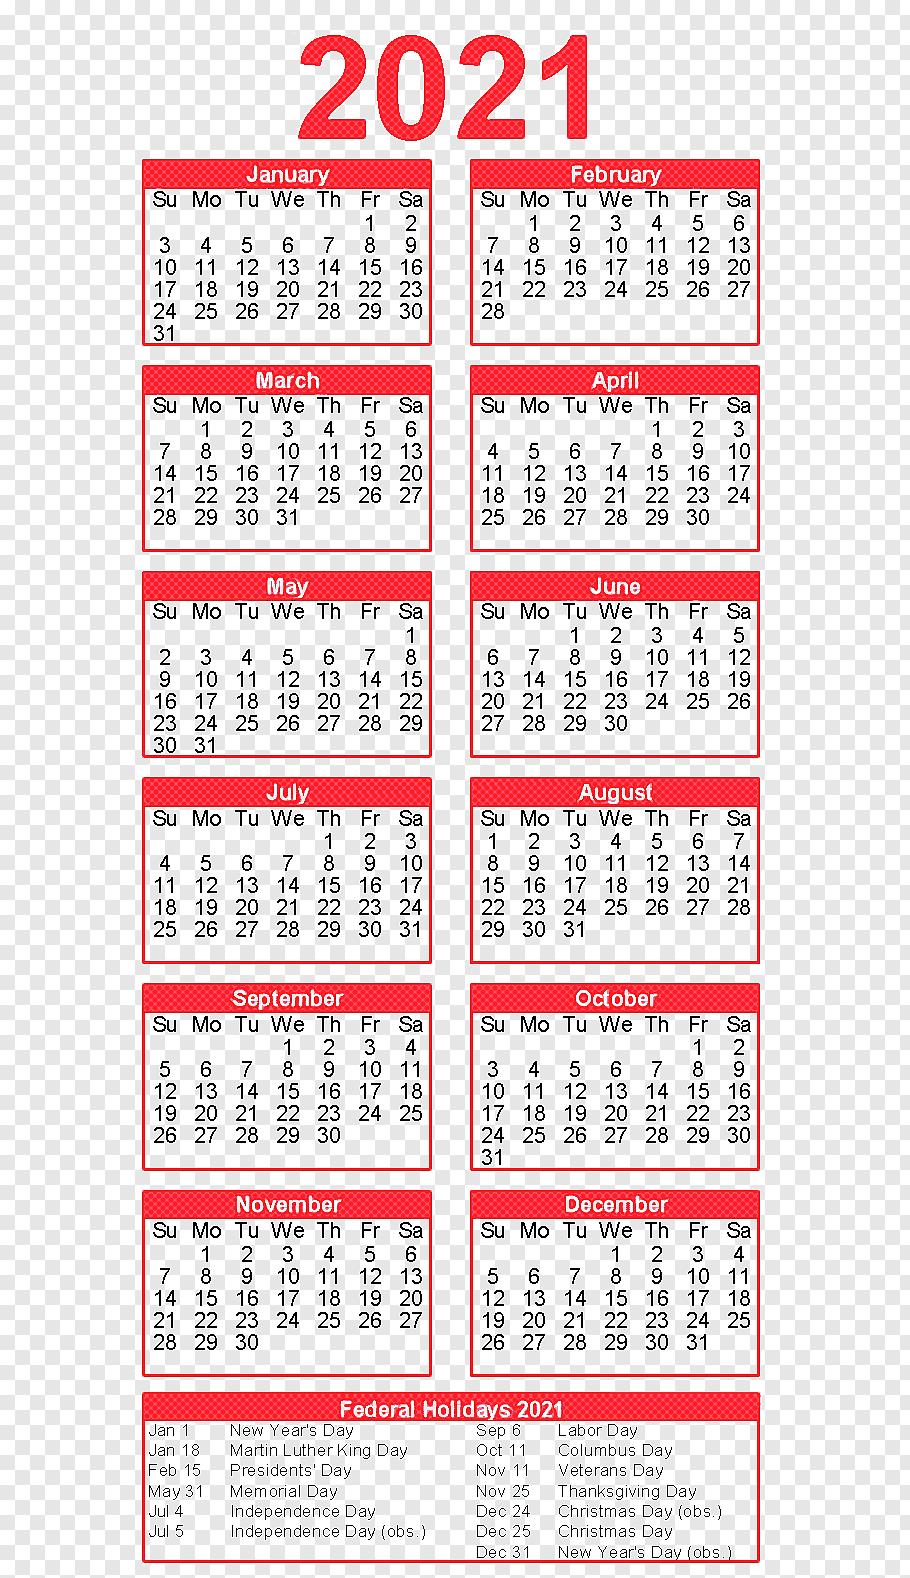 12 Month Lunar Calendar 2021 | Calendar 2021 Throughout Boise State University Calendar 2021